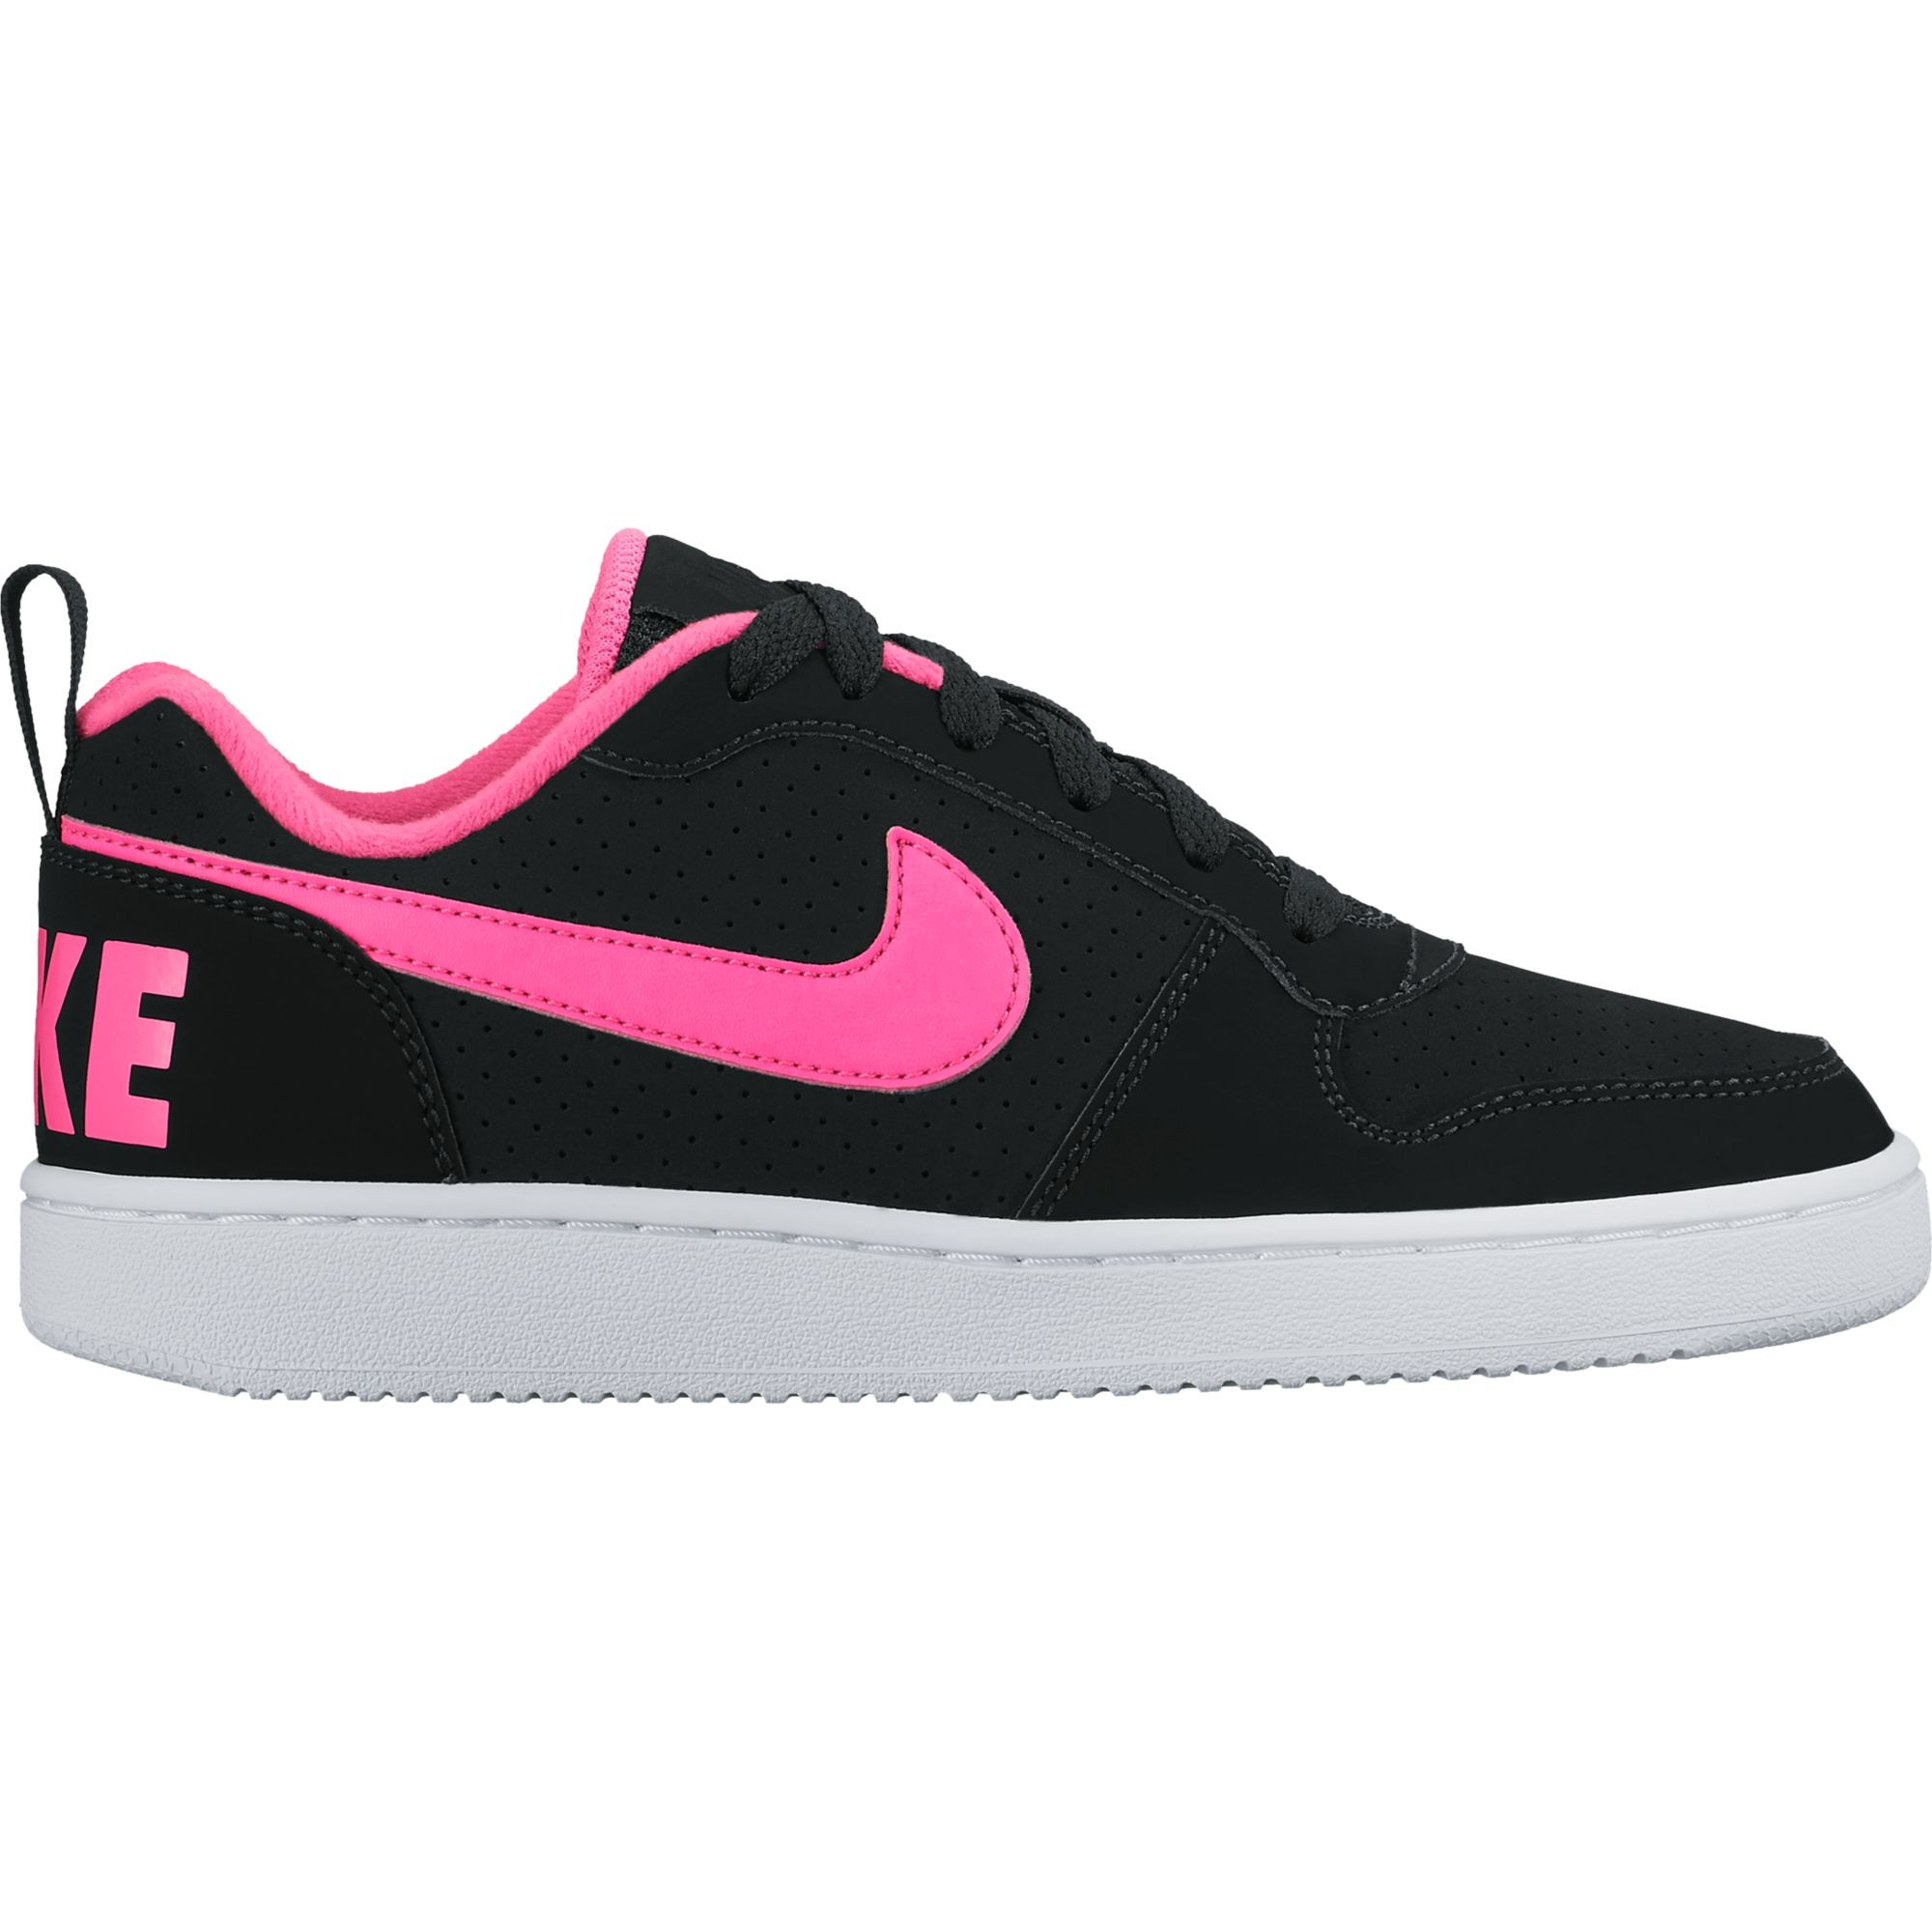 Zapatillas Nike Court Borough Low GS 845104 006 - Deportes Manzanedo 086927b5781